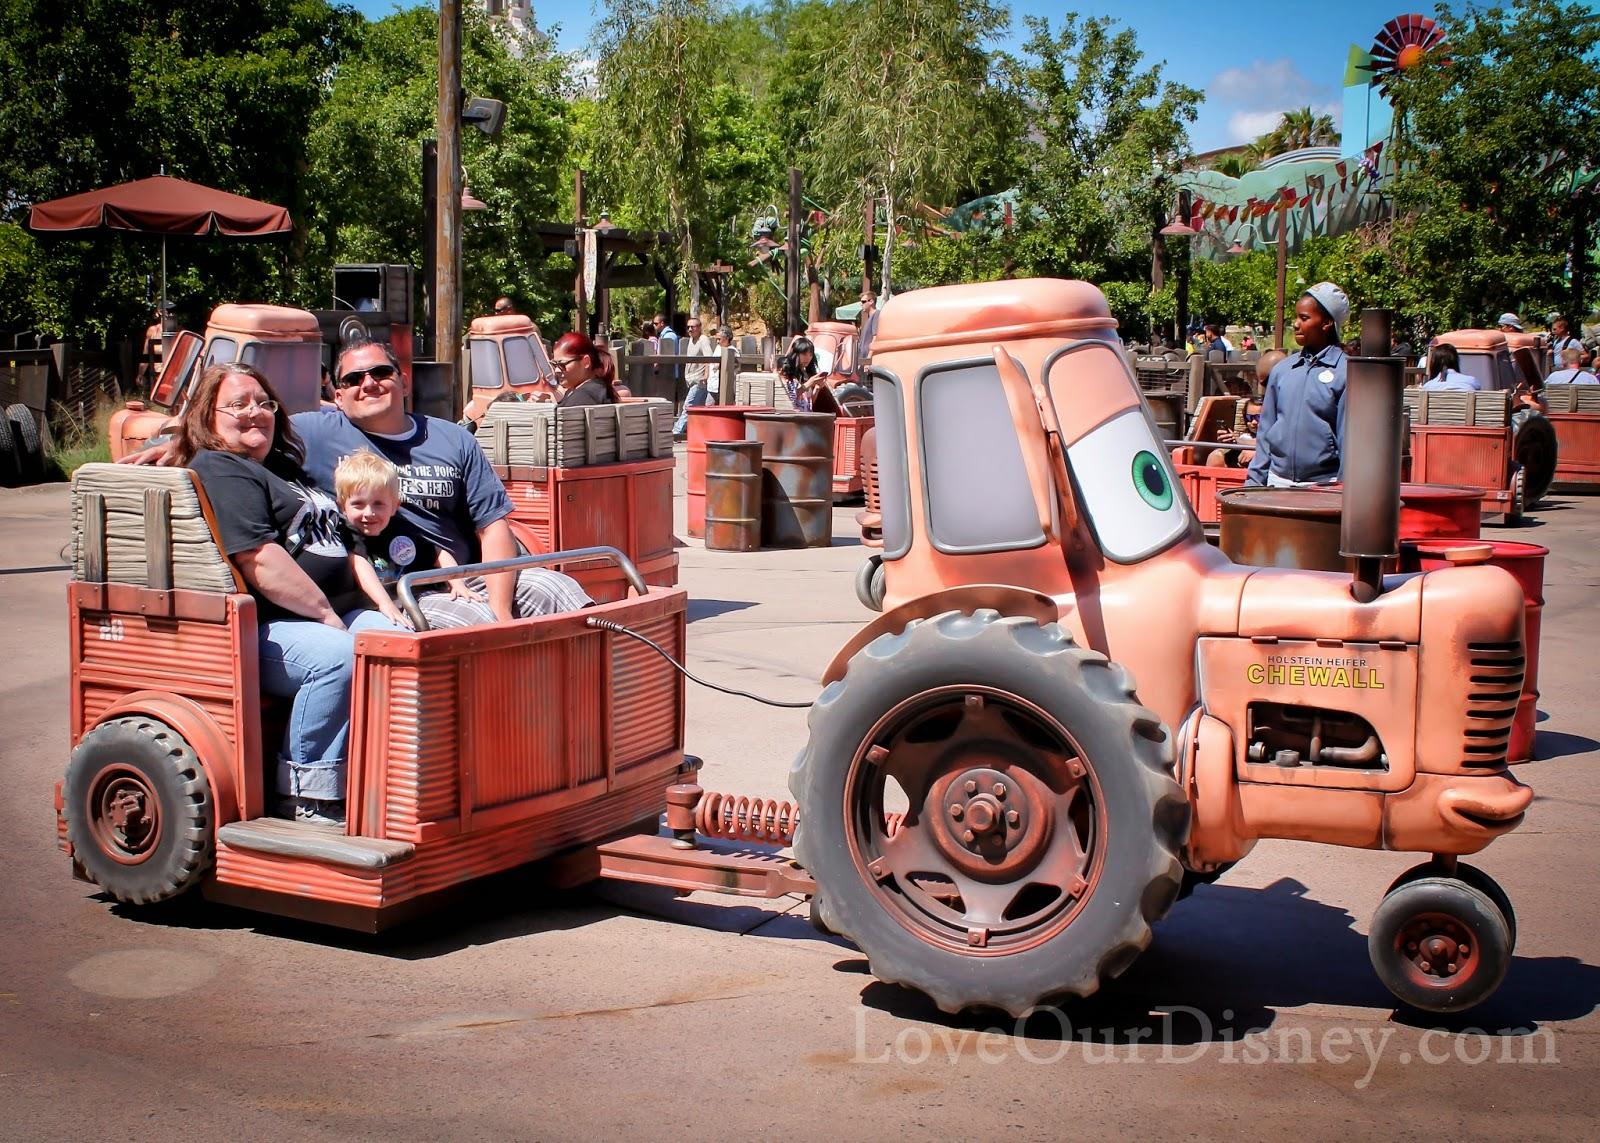 Favorite rides for preschoolers at Disneyland Resort. LoveOurDisney.com